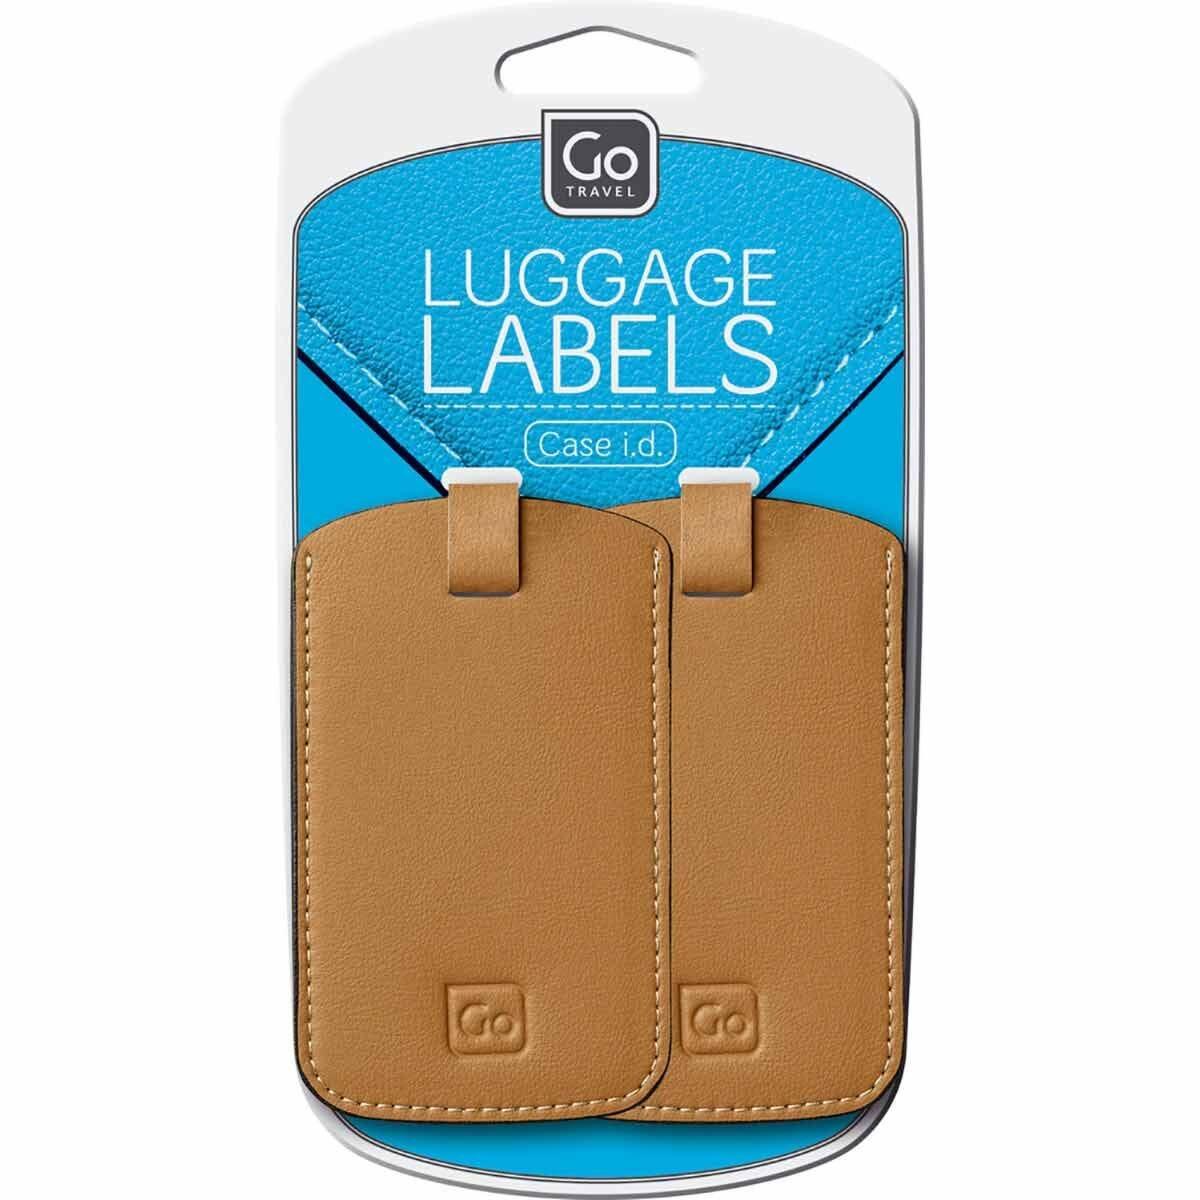 Go Travel Luggage Tags